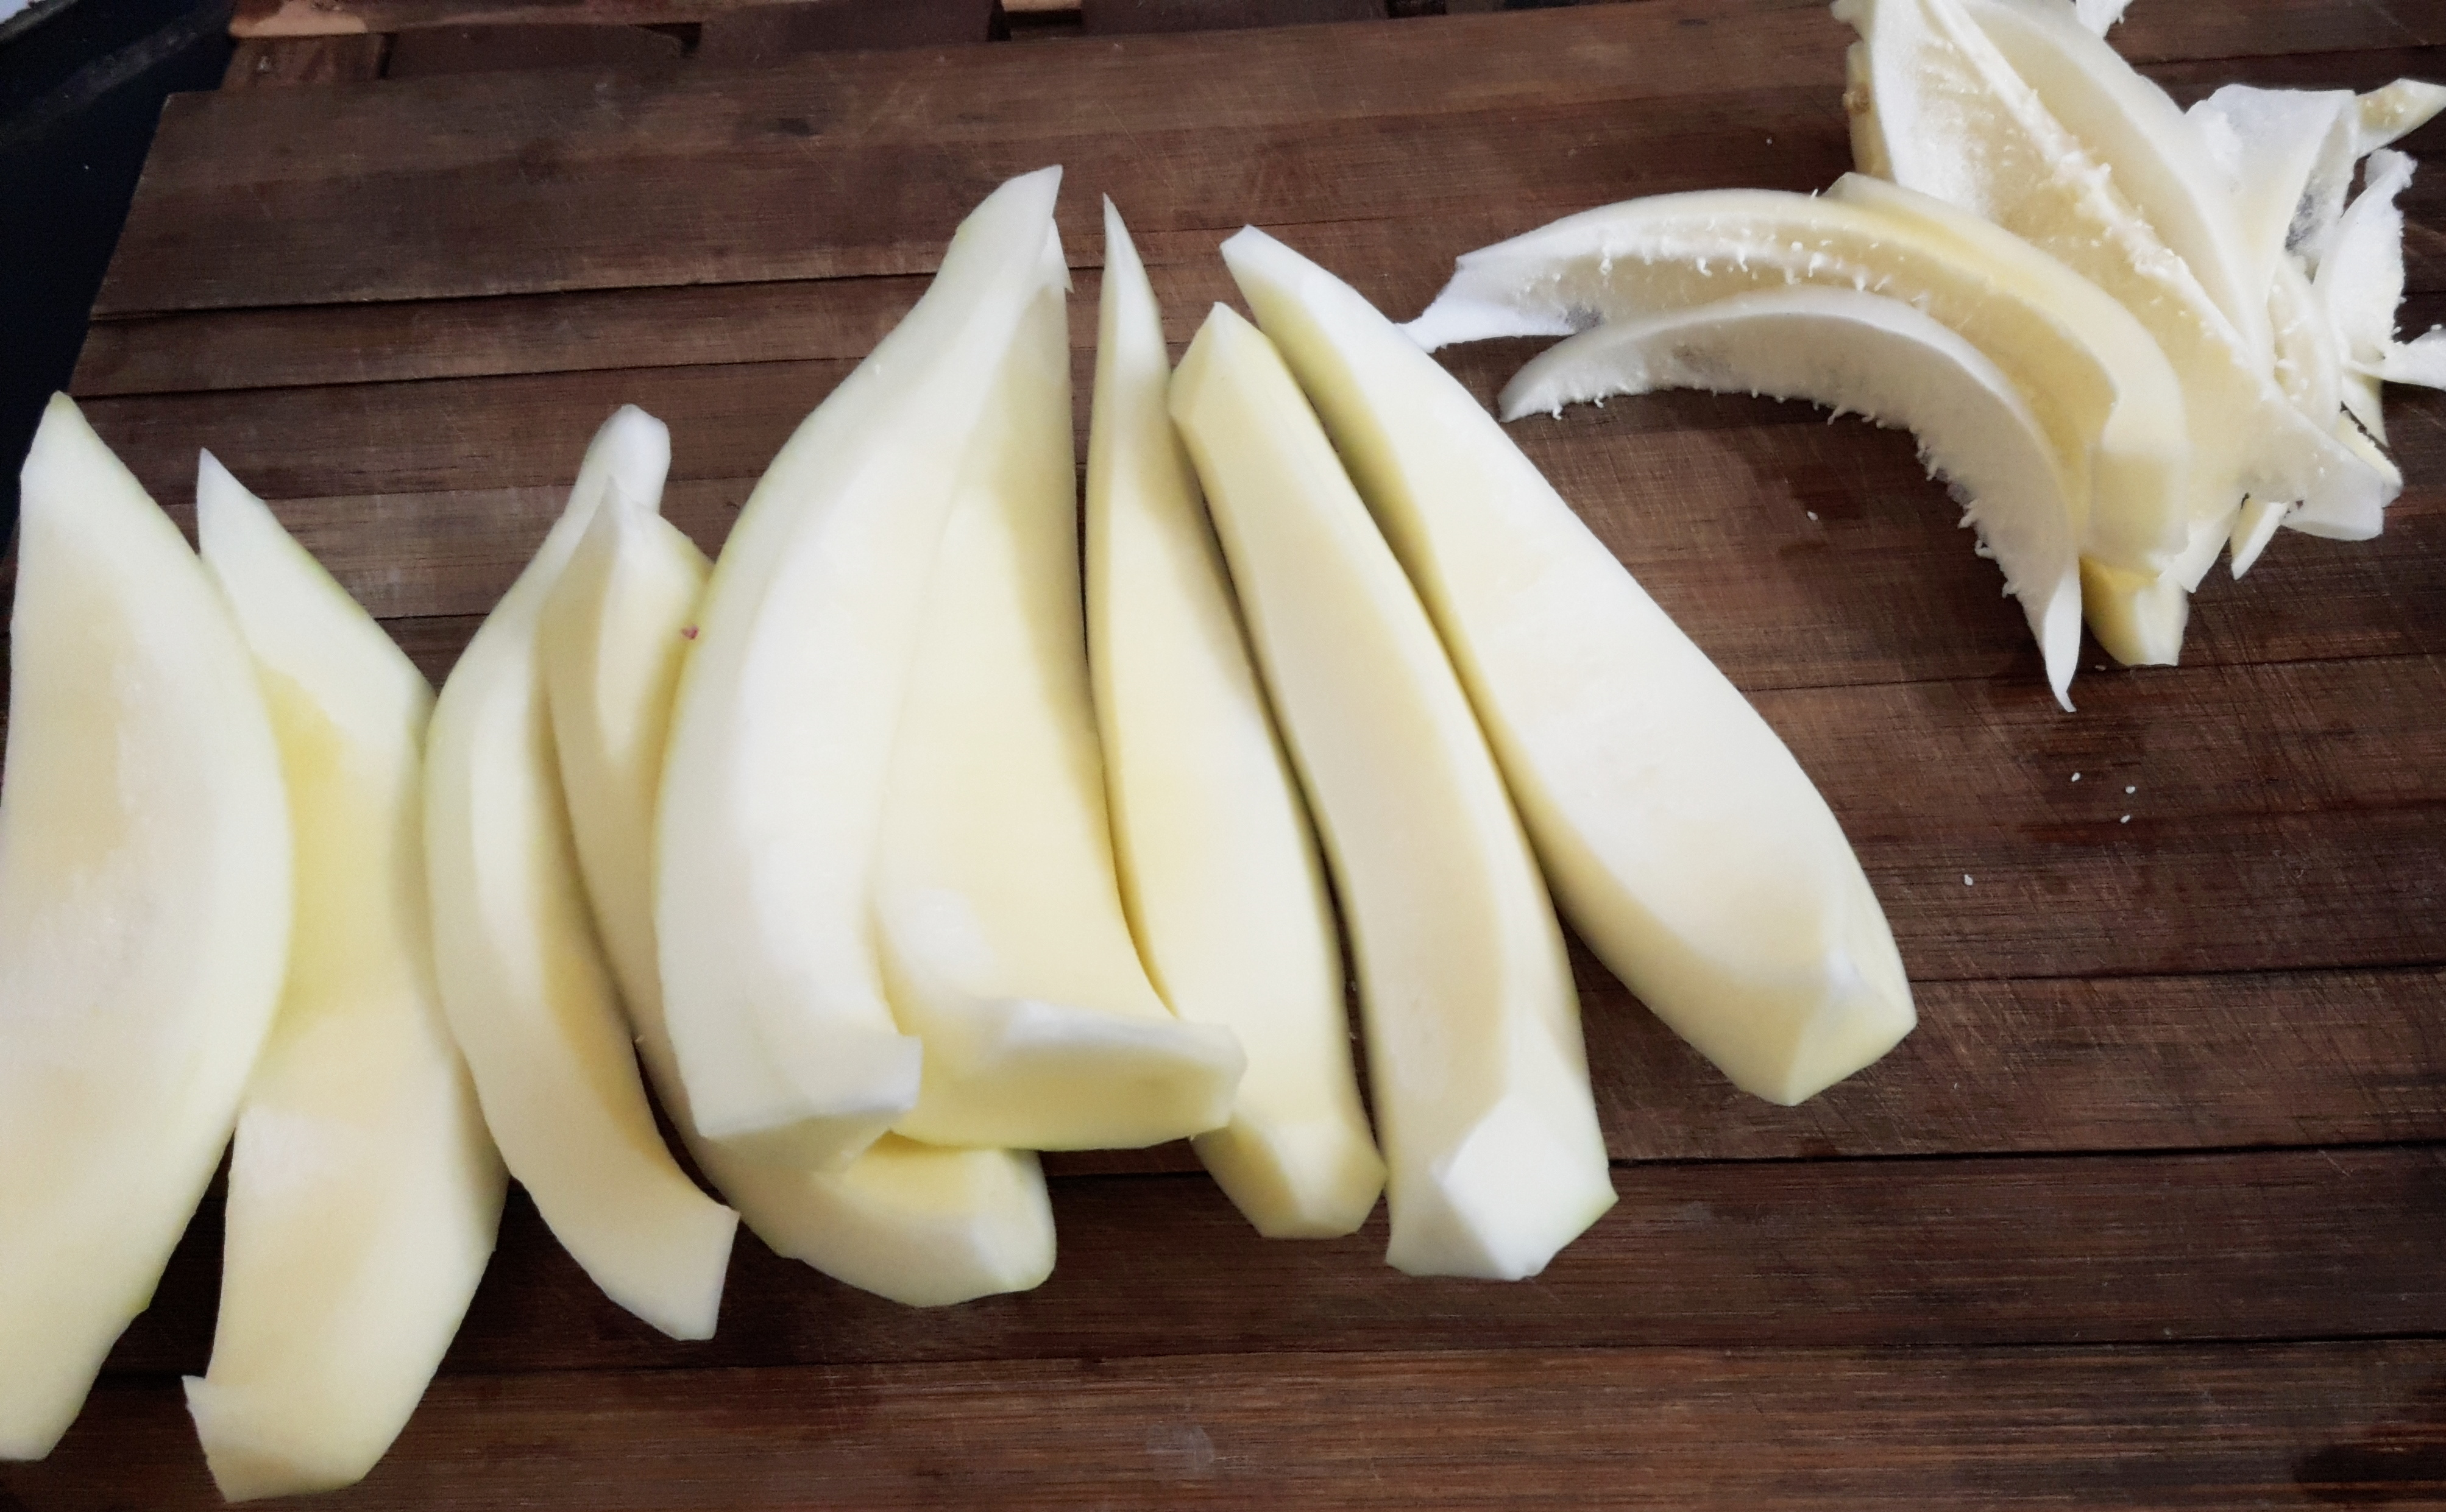 Peel off and grate the raw papaya